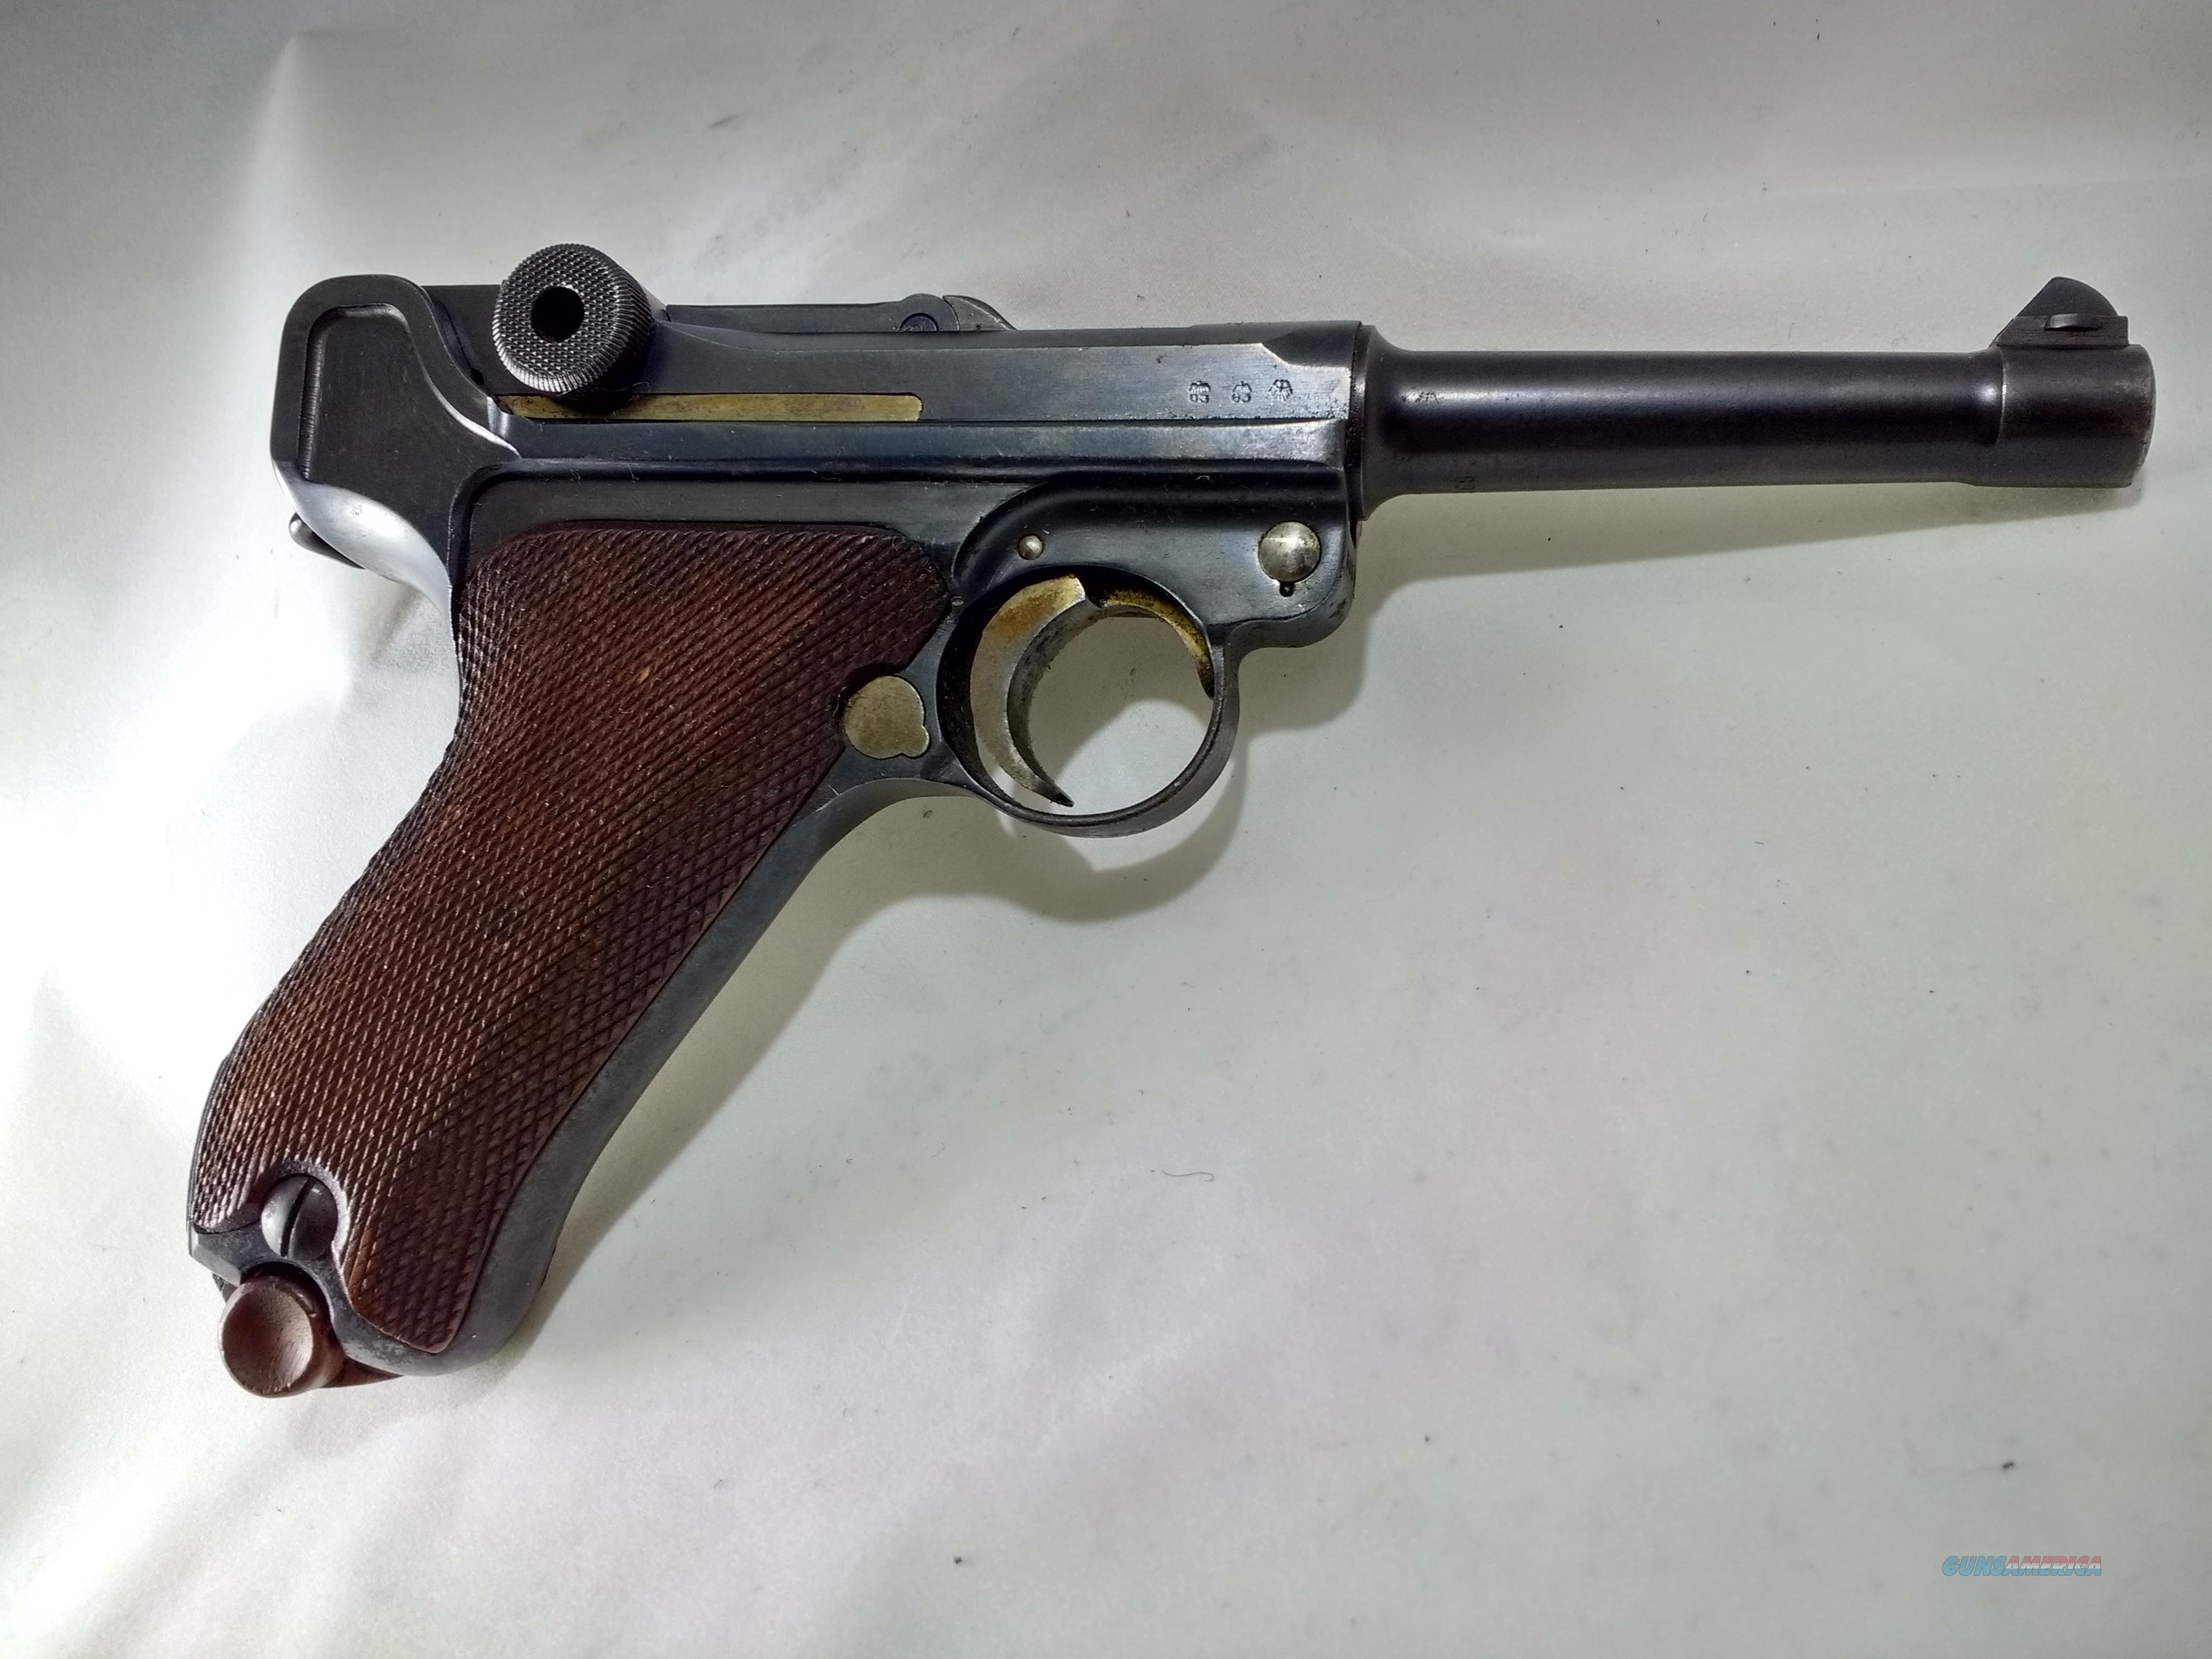 1937 GERMAN LUGER  Guns > Pistols > Luger Pistols